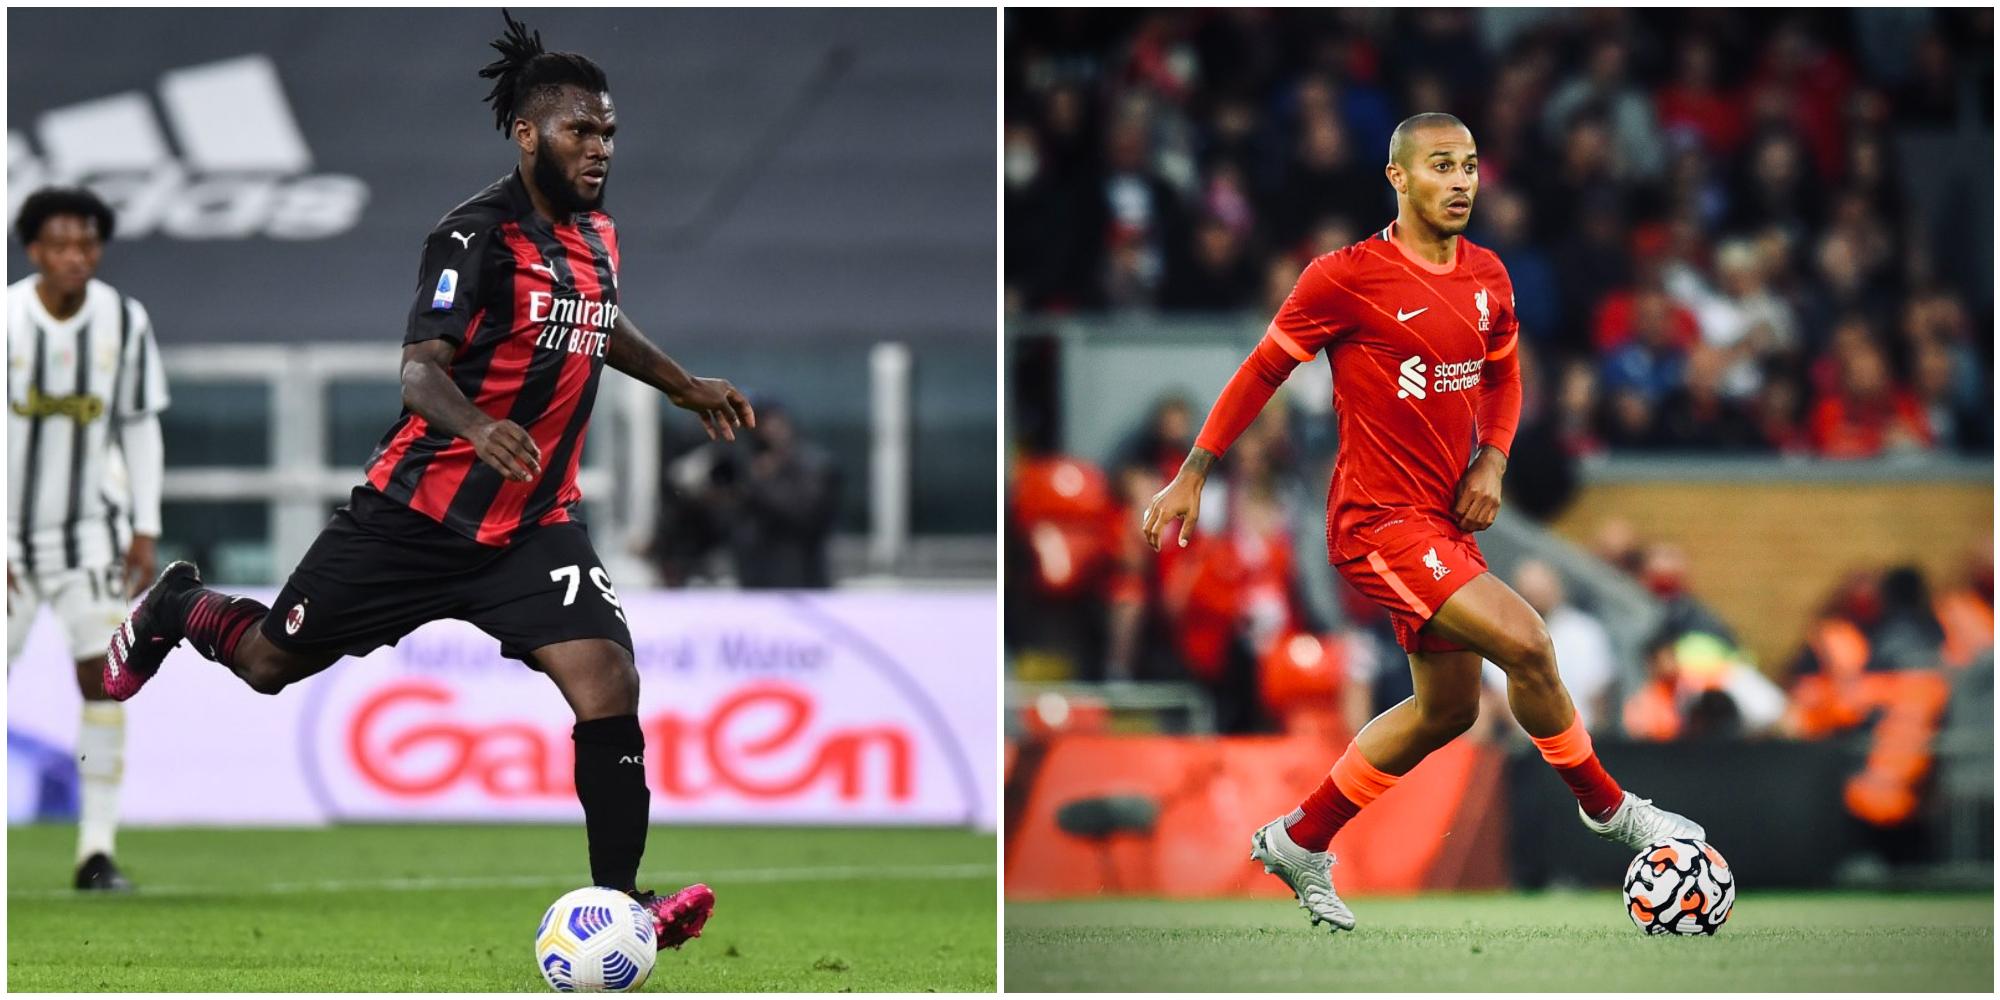 Serie A giants would entertain Franck Kessie swap for Liverpool's Thiago Alcantara – report